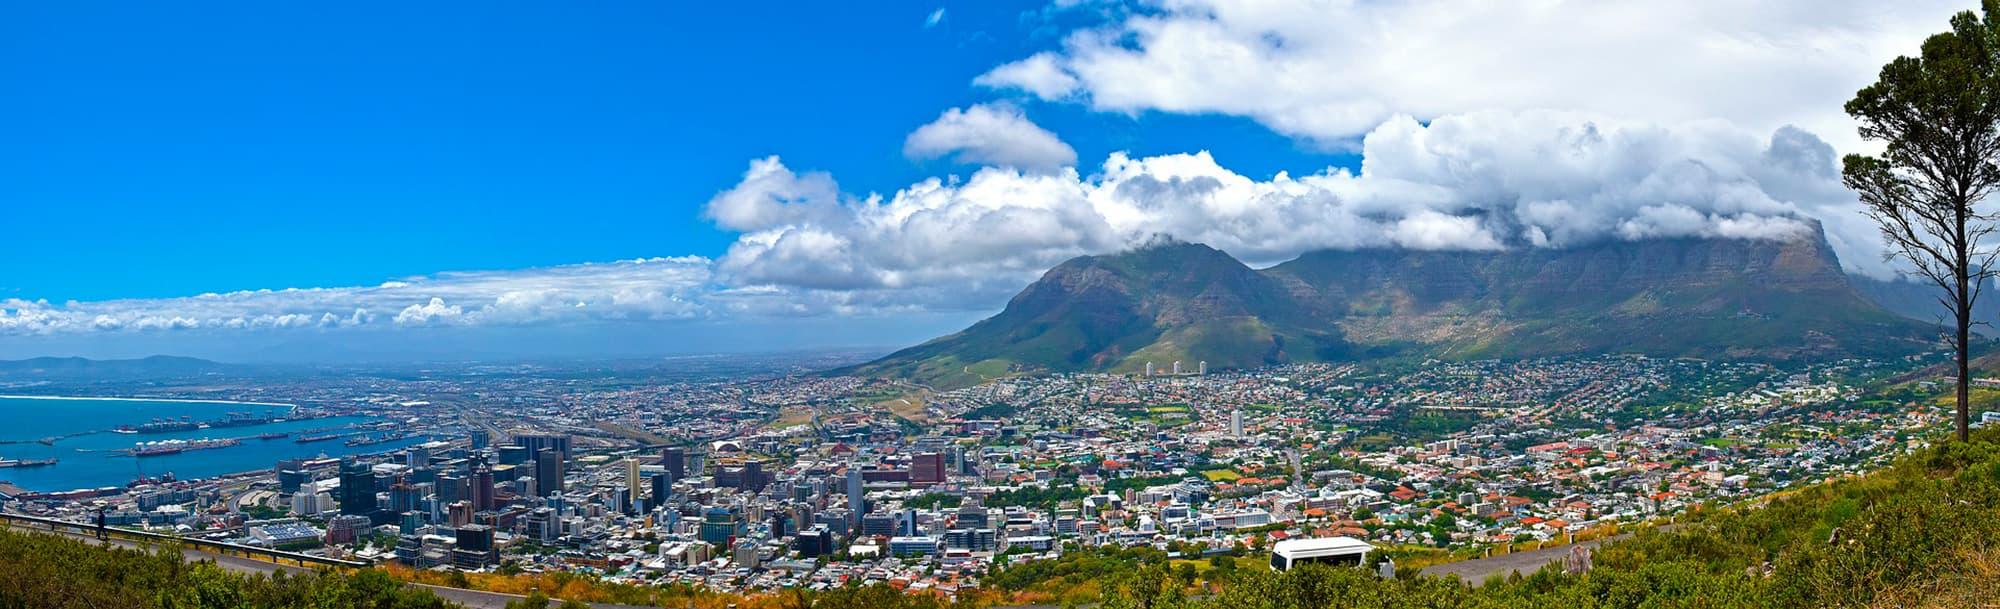 Gran Tour de Sudáfrica, Cataratas Victoria e isla Mauricio - Sudáfrica- imagen #3